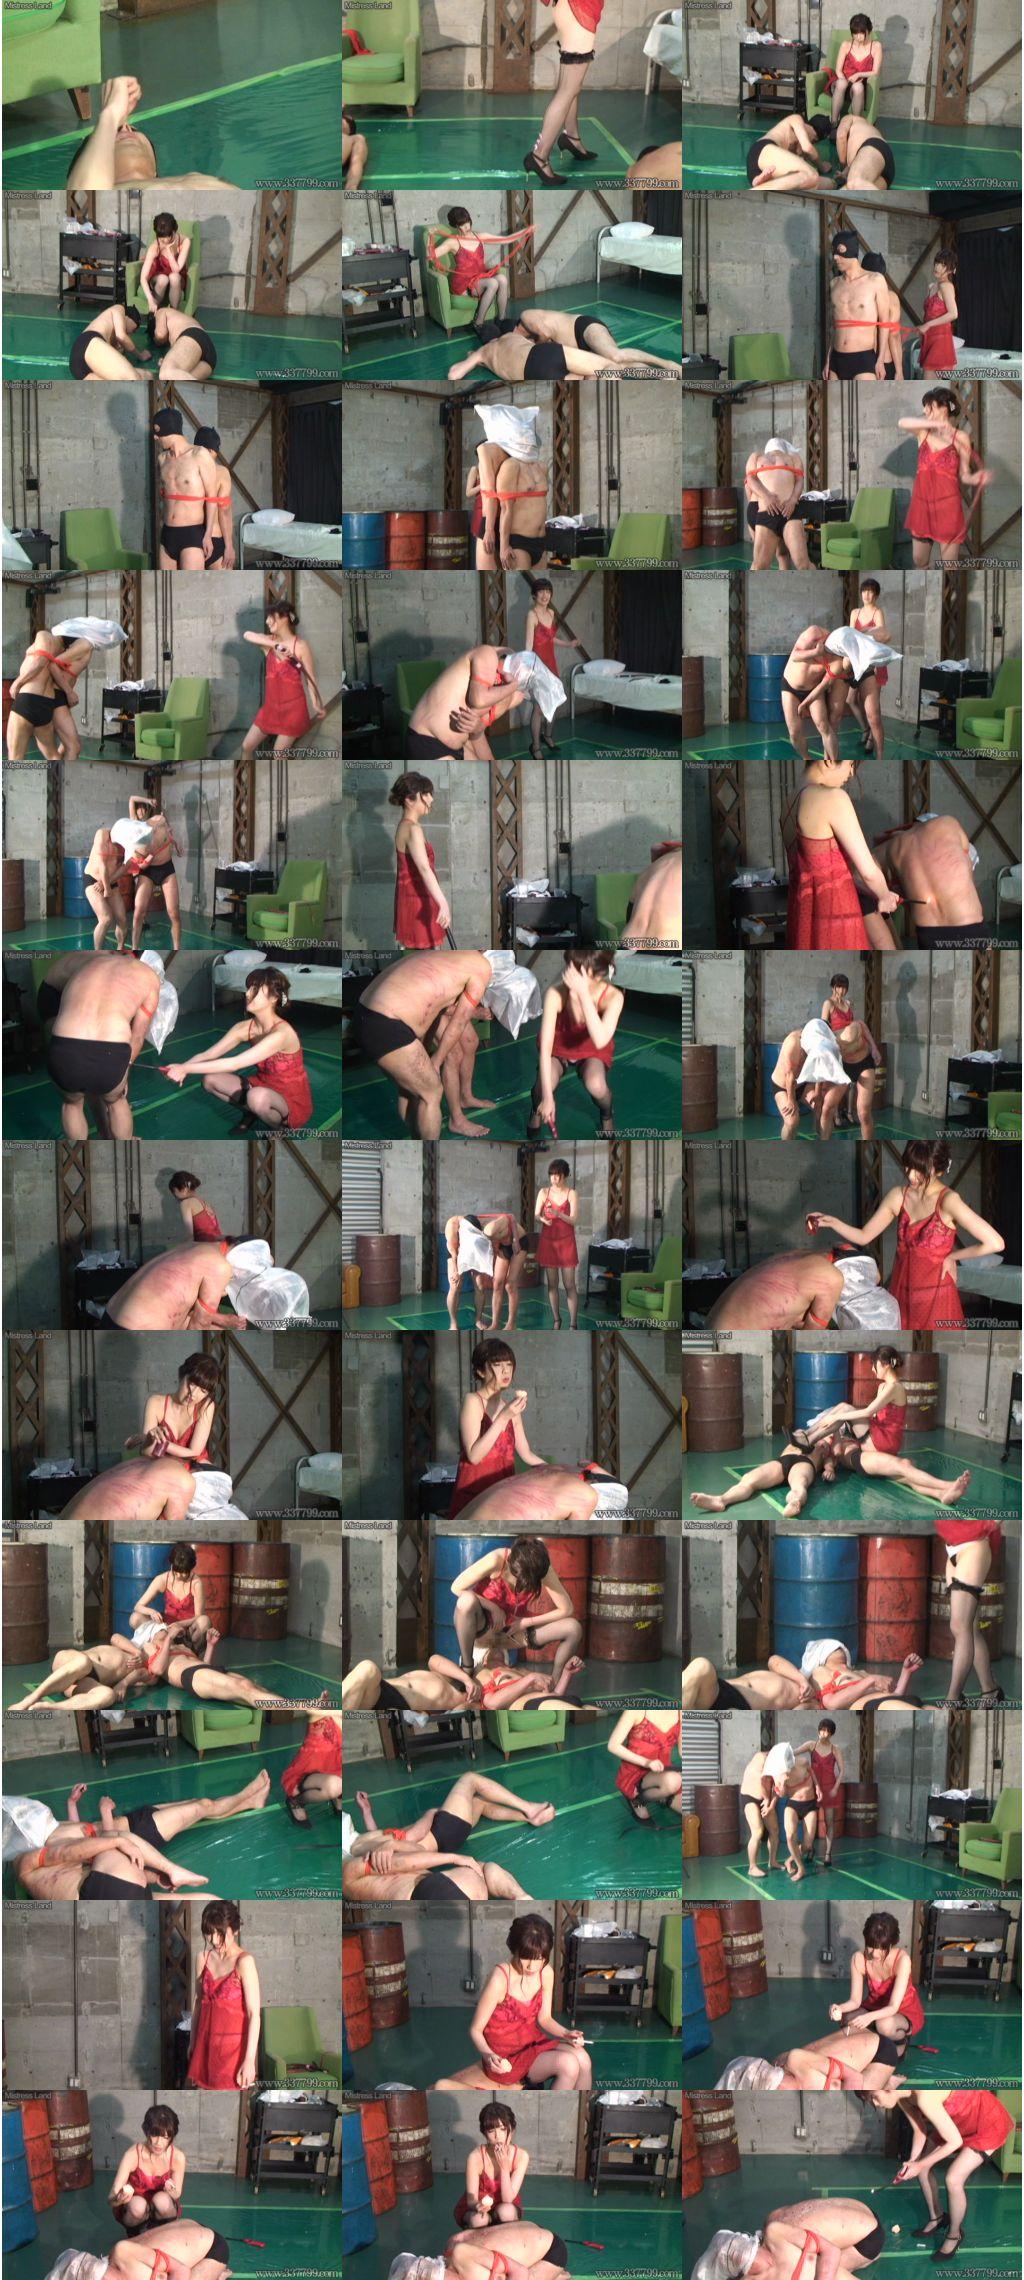 mldo 147 4 s - [MLDO-147] サド女研究者のマゾ男人体実験 麻美   Scat  Pissing SM スパンキング・鞭打ち